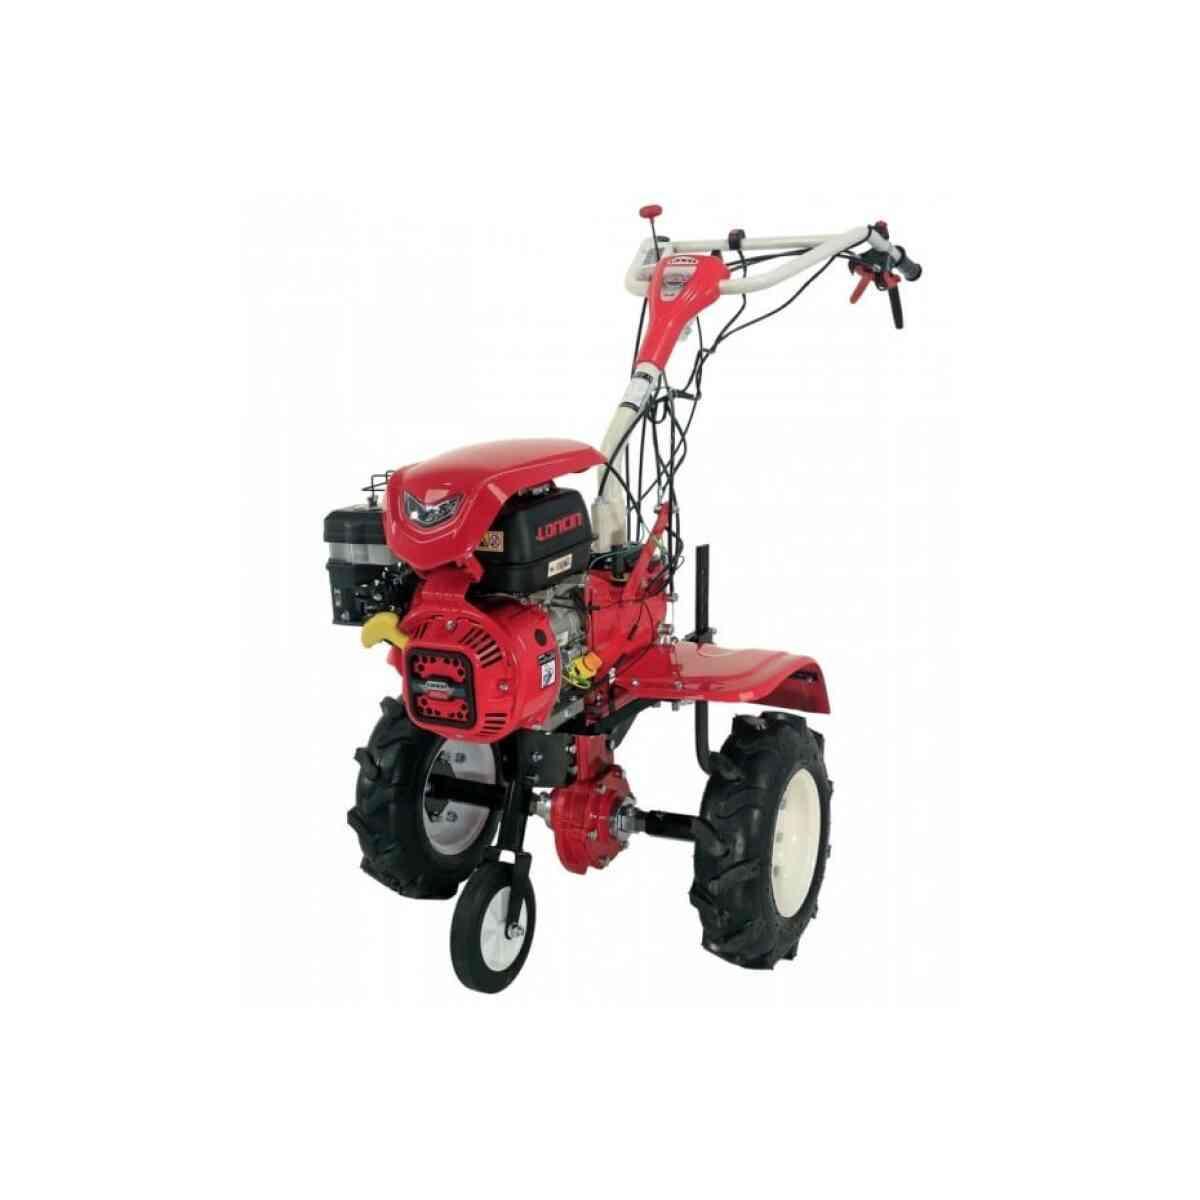 motocultor loncin lc1200 3plus1 o mac.ro 2 1 99